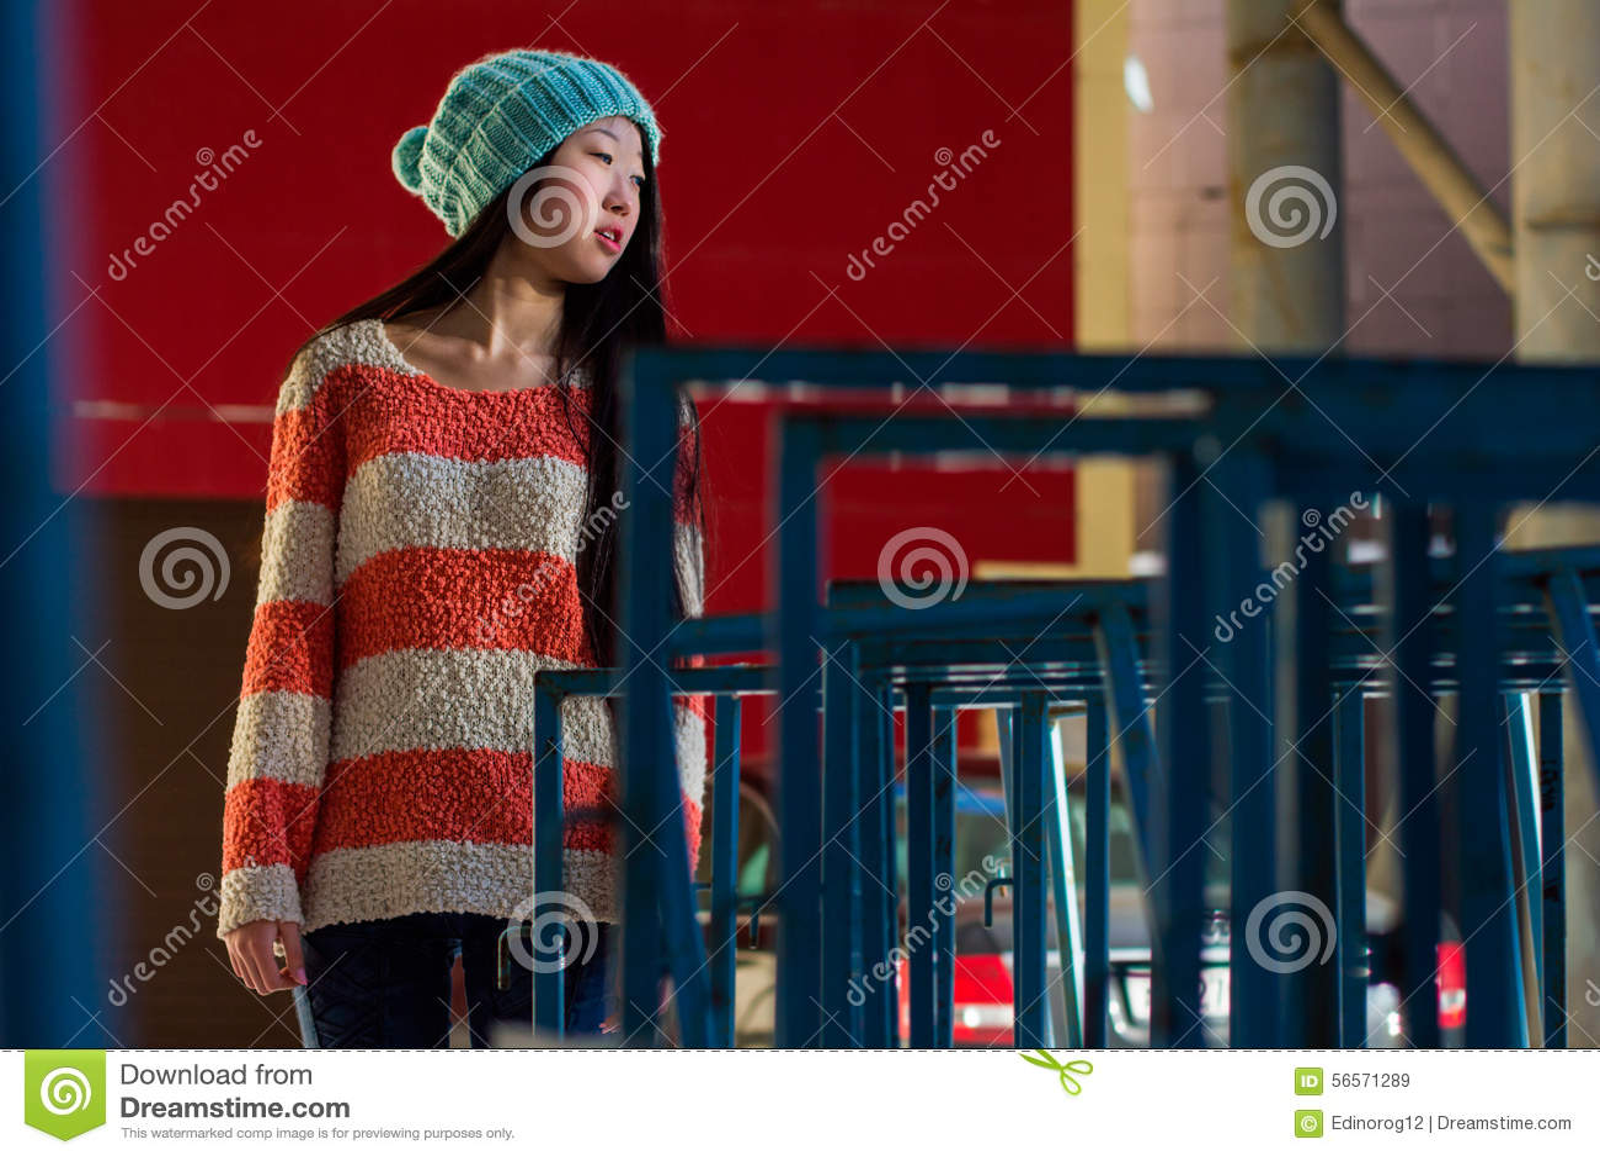 Download Πορτρέτο του μοντέρνου ασιατικού κοριτσιού στην οδό Στοκ Εικόνα - εικόνα από τρίχωμα, λυπημένος: 56571289